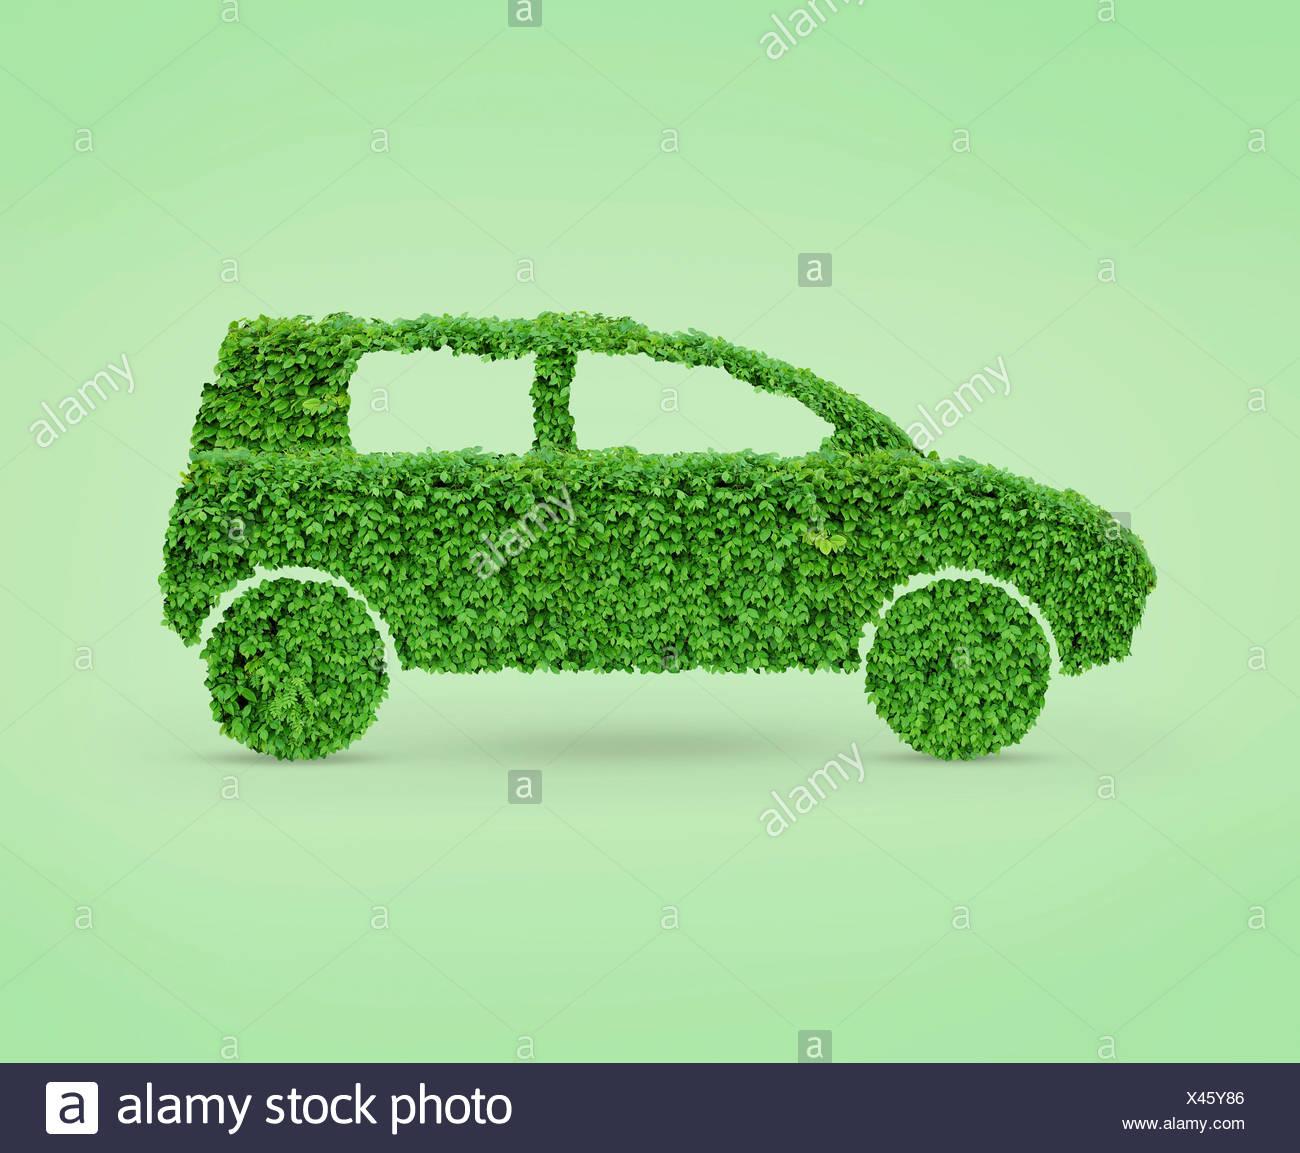 Grünes Auto, Automobile Form hergestellt aus grünen Blättern Stockbild